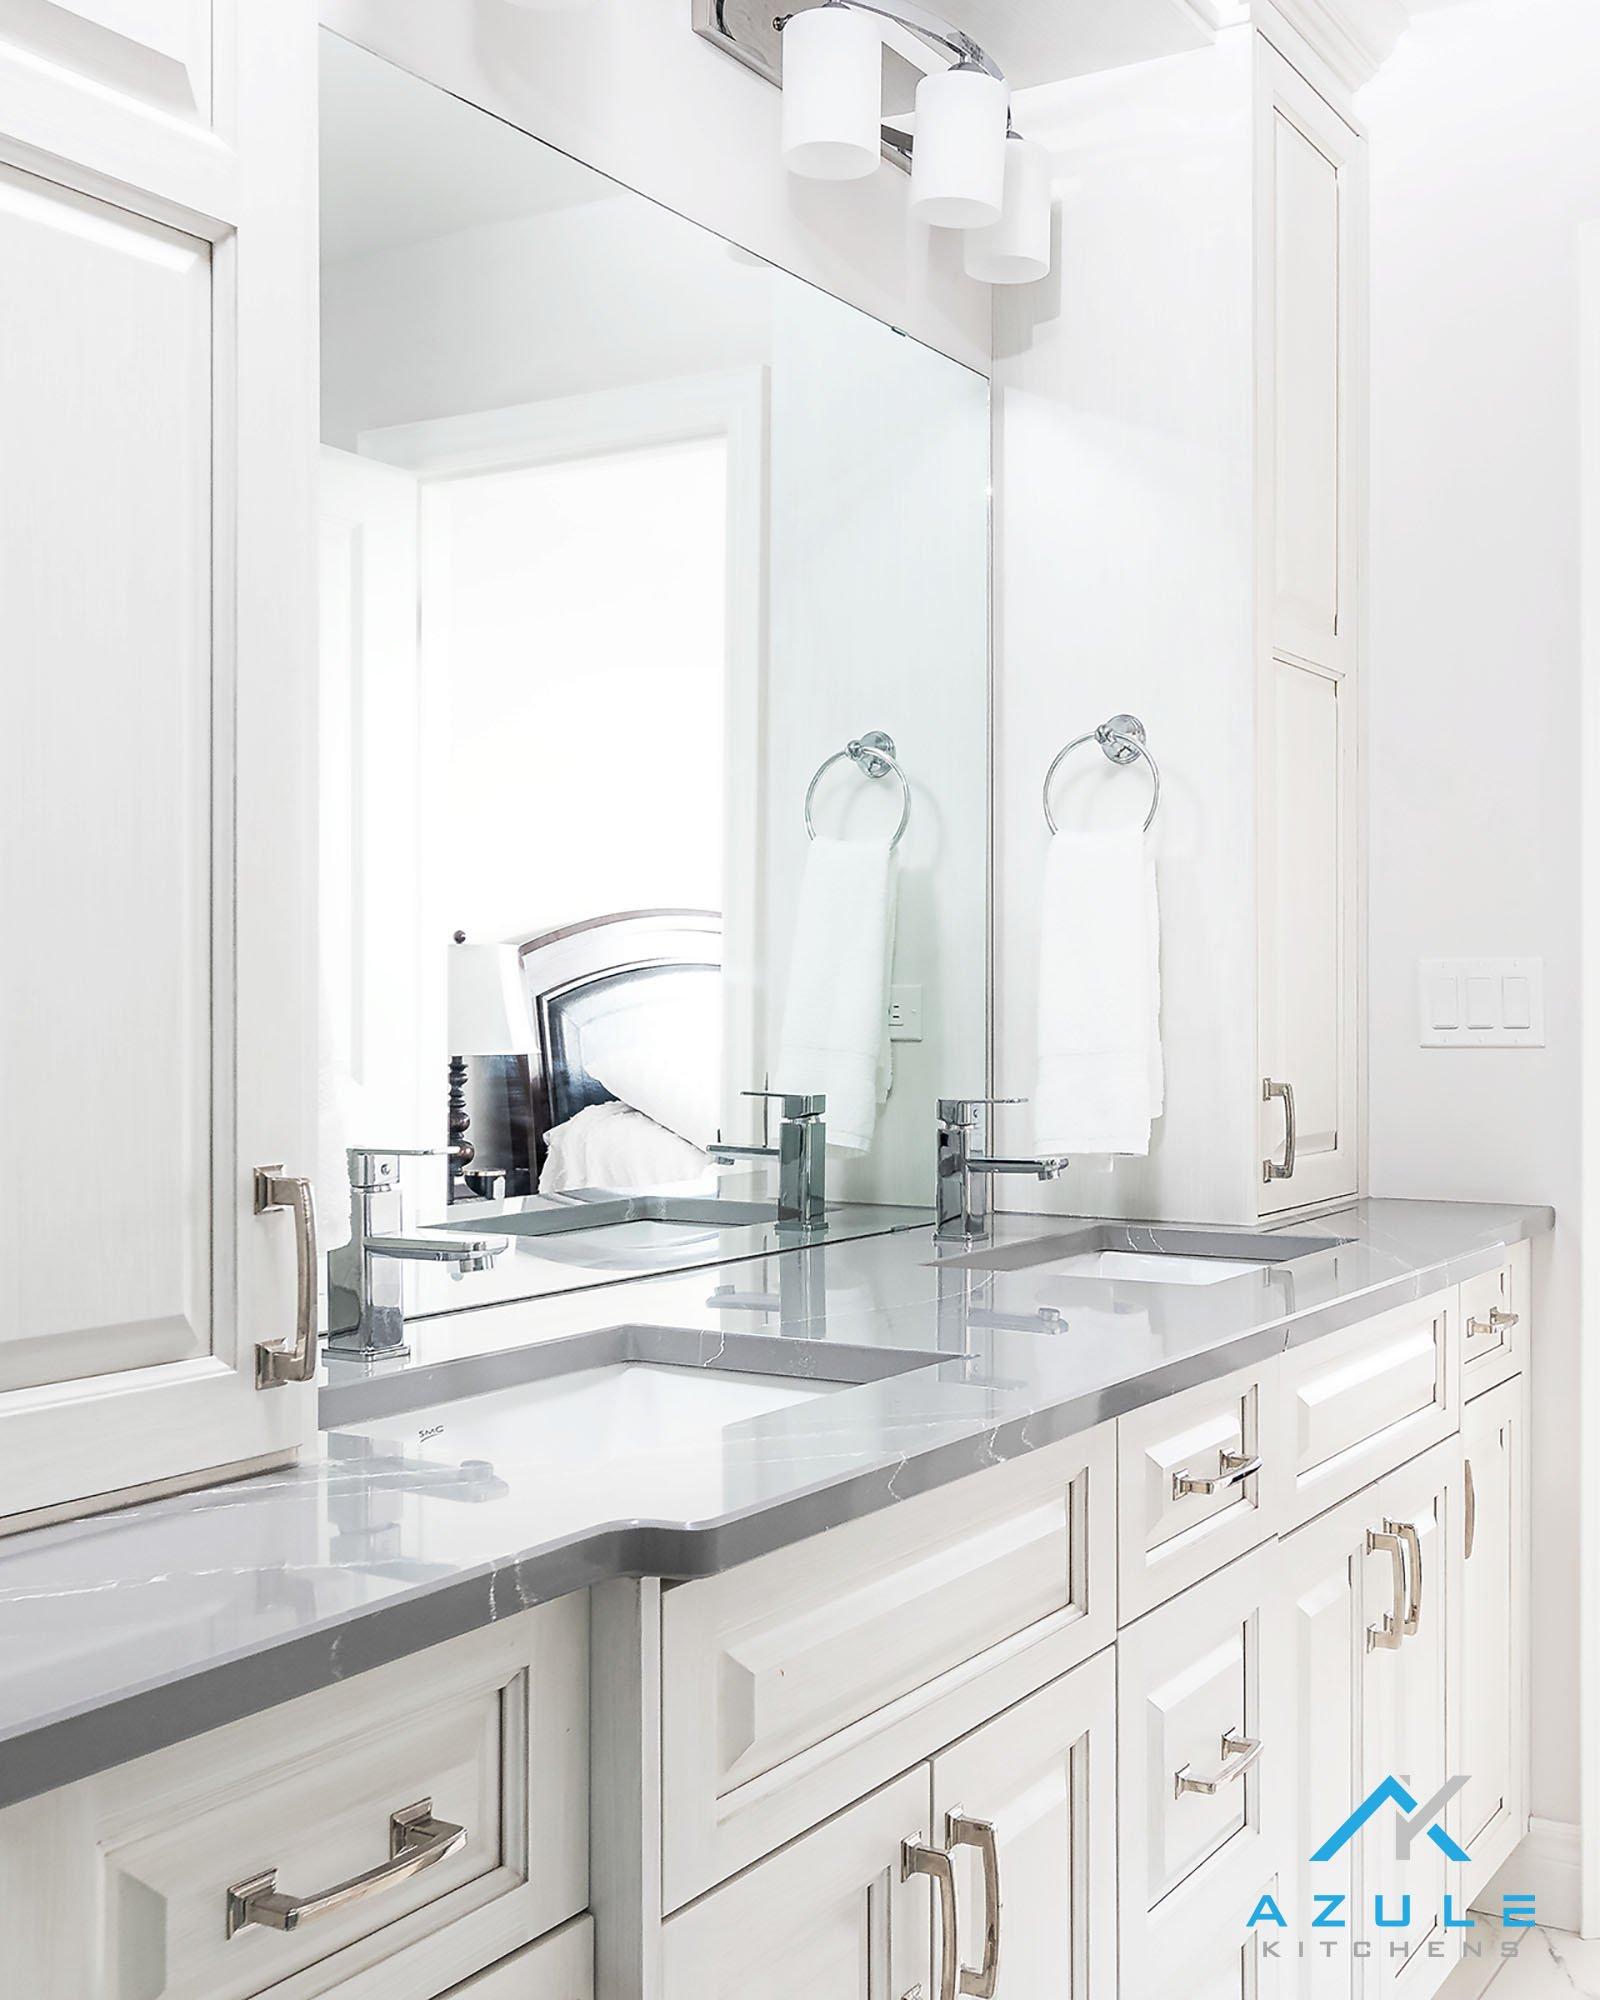 Azule Kitchens – Modern Bathroom Gloss White Storage Cabinet Basin